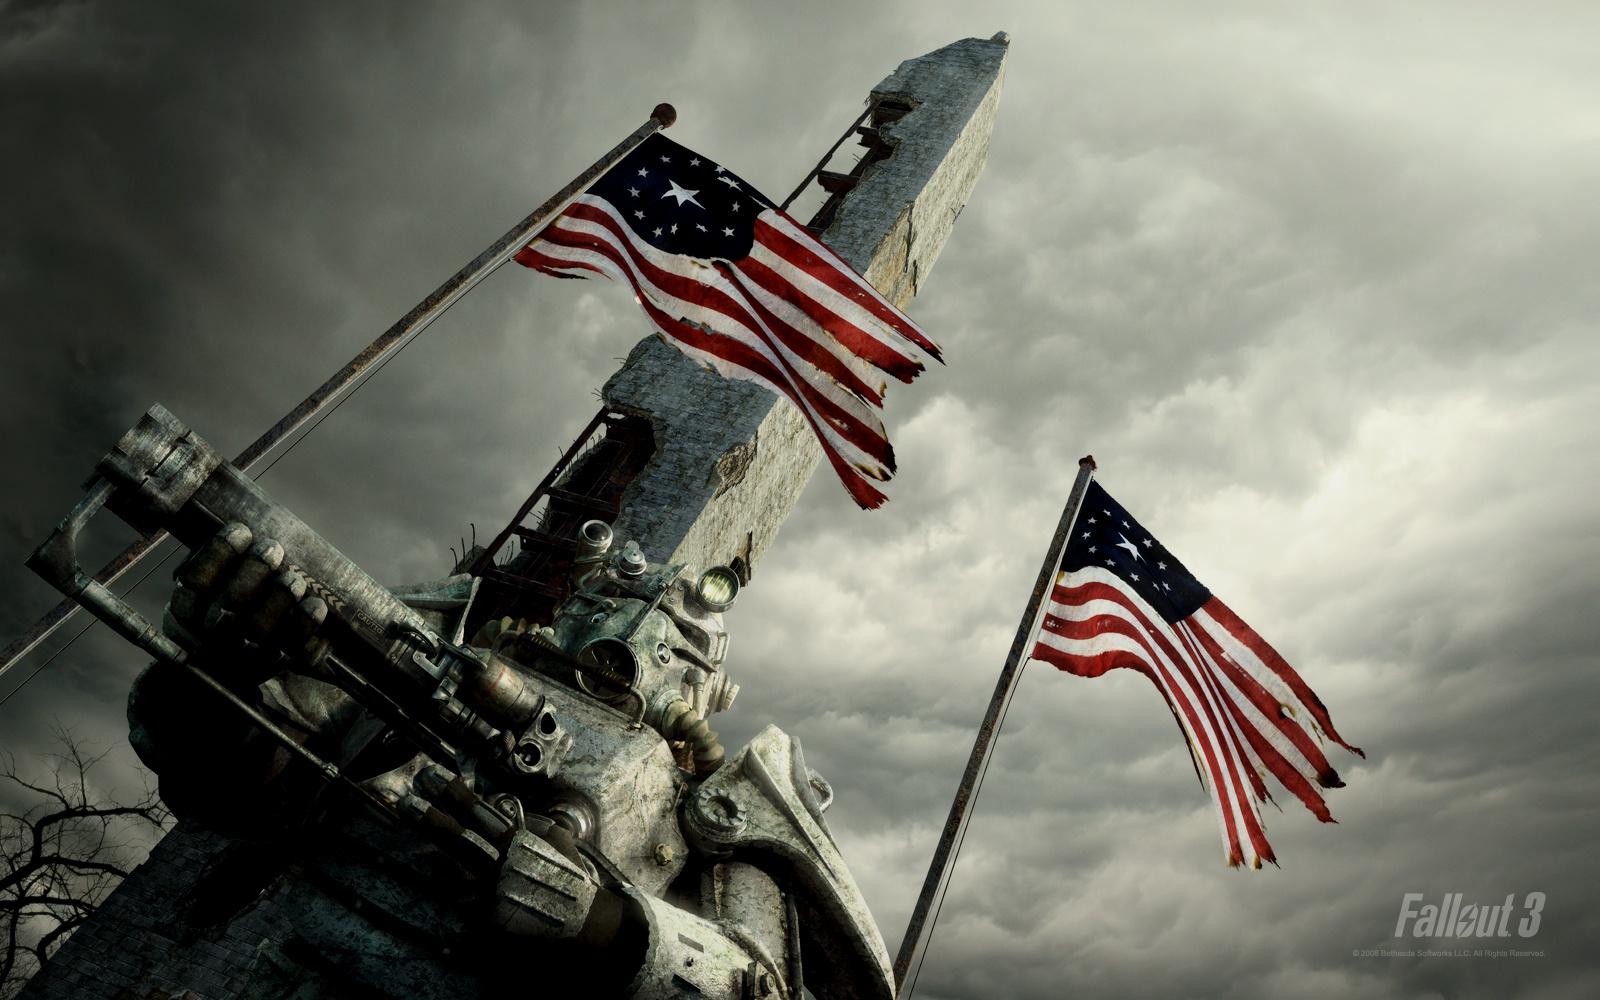 Fallout Brotherhood of Steel Waving Flags HD Wallpaper 1600x1000